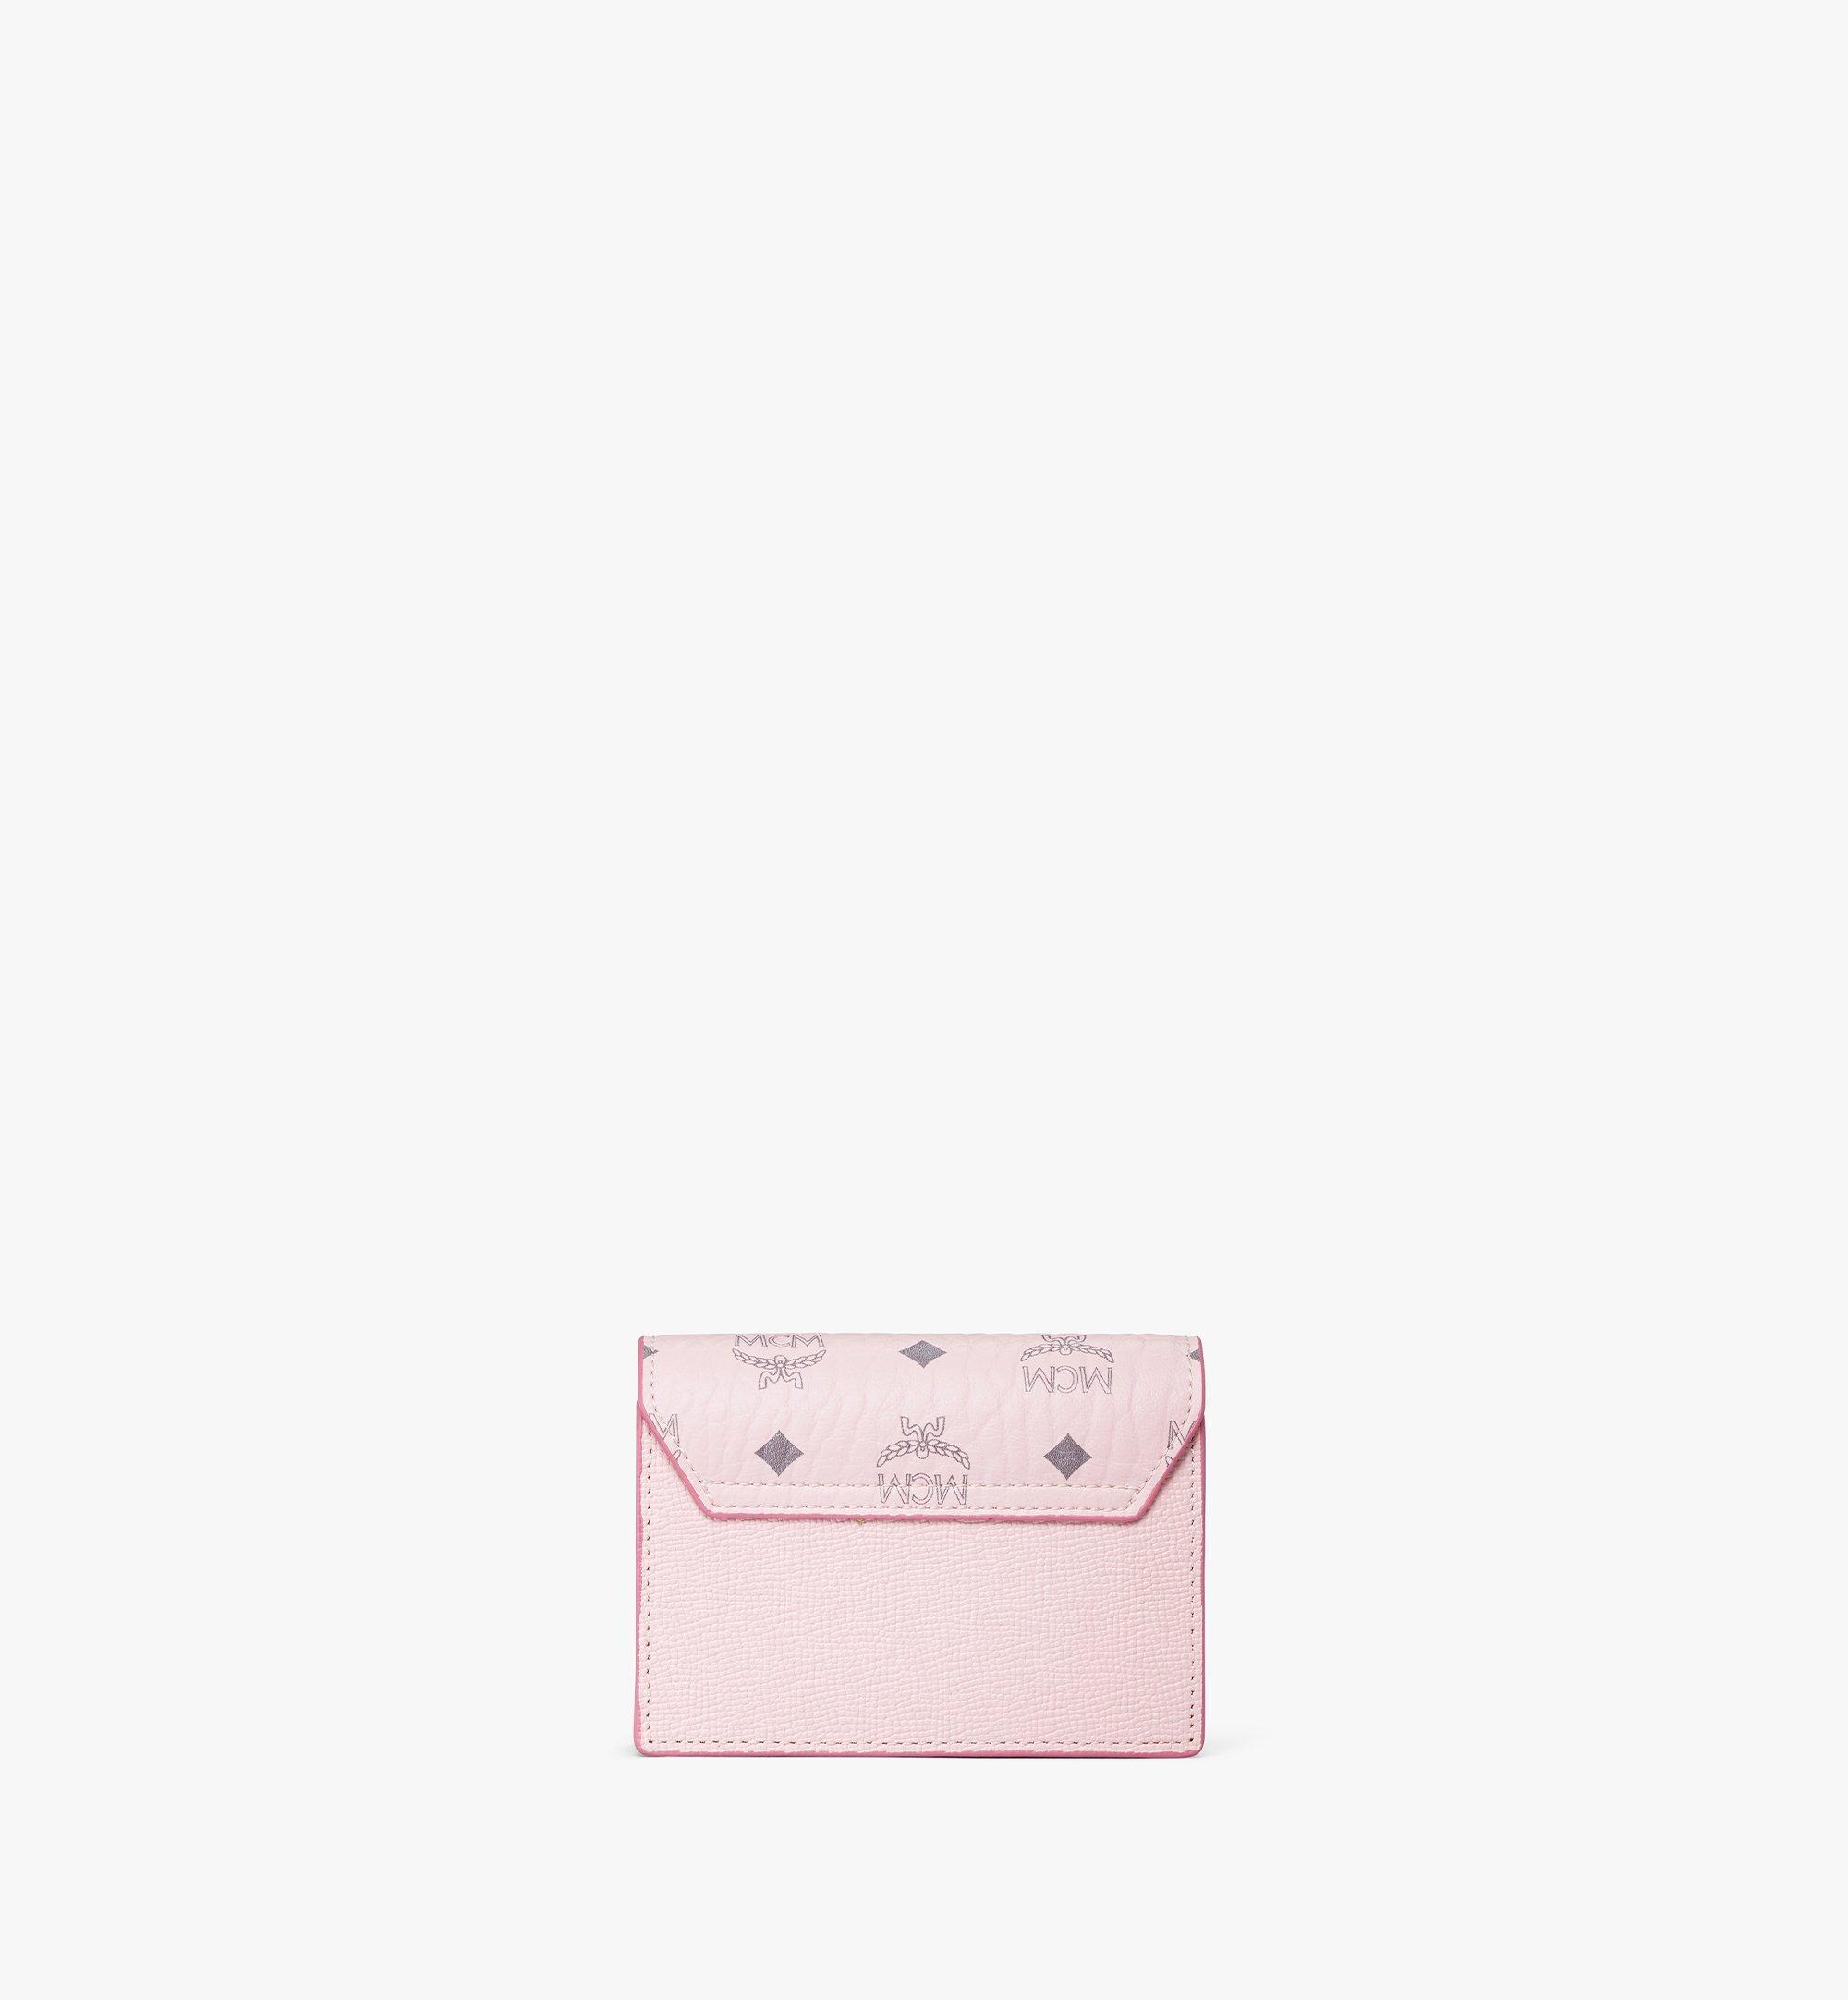 MCM 拼色 Visetos 皮革 Mena 手風琴卡片夾 Pink MYSAALM03QH001 更多視圖 2